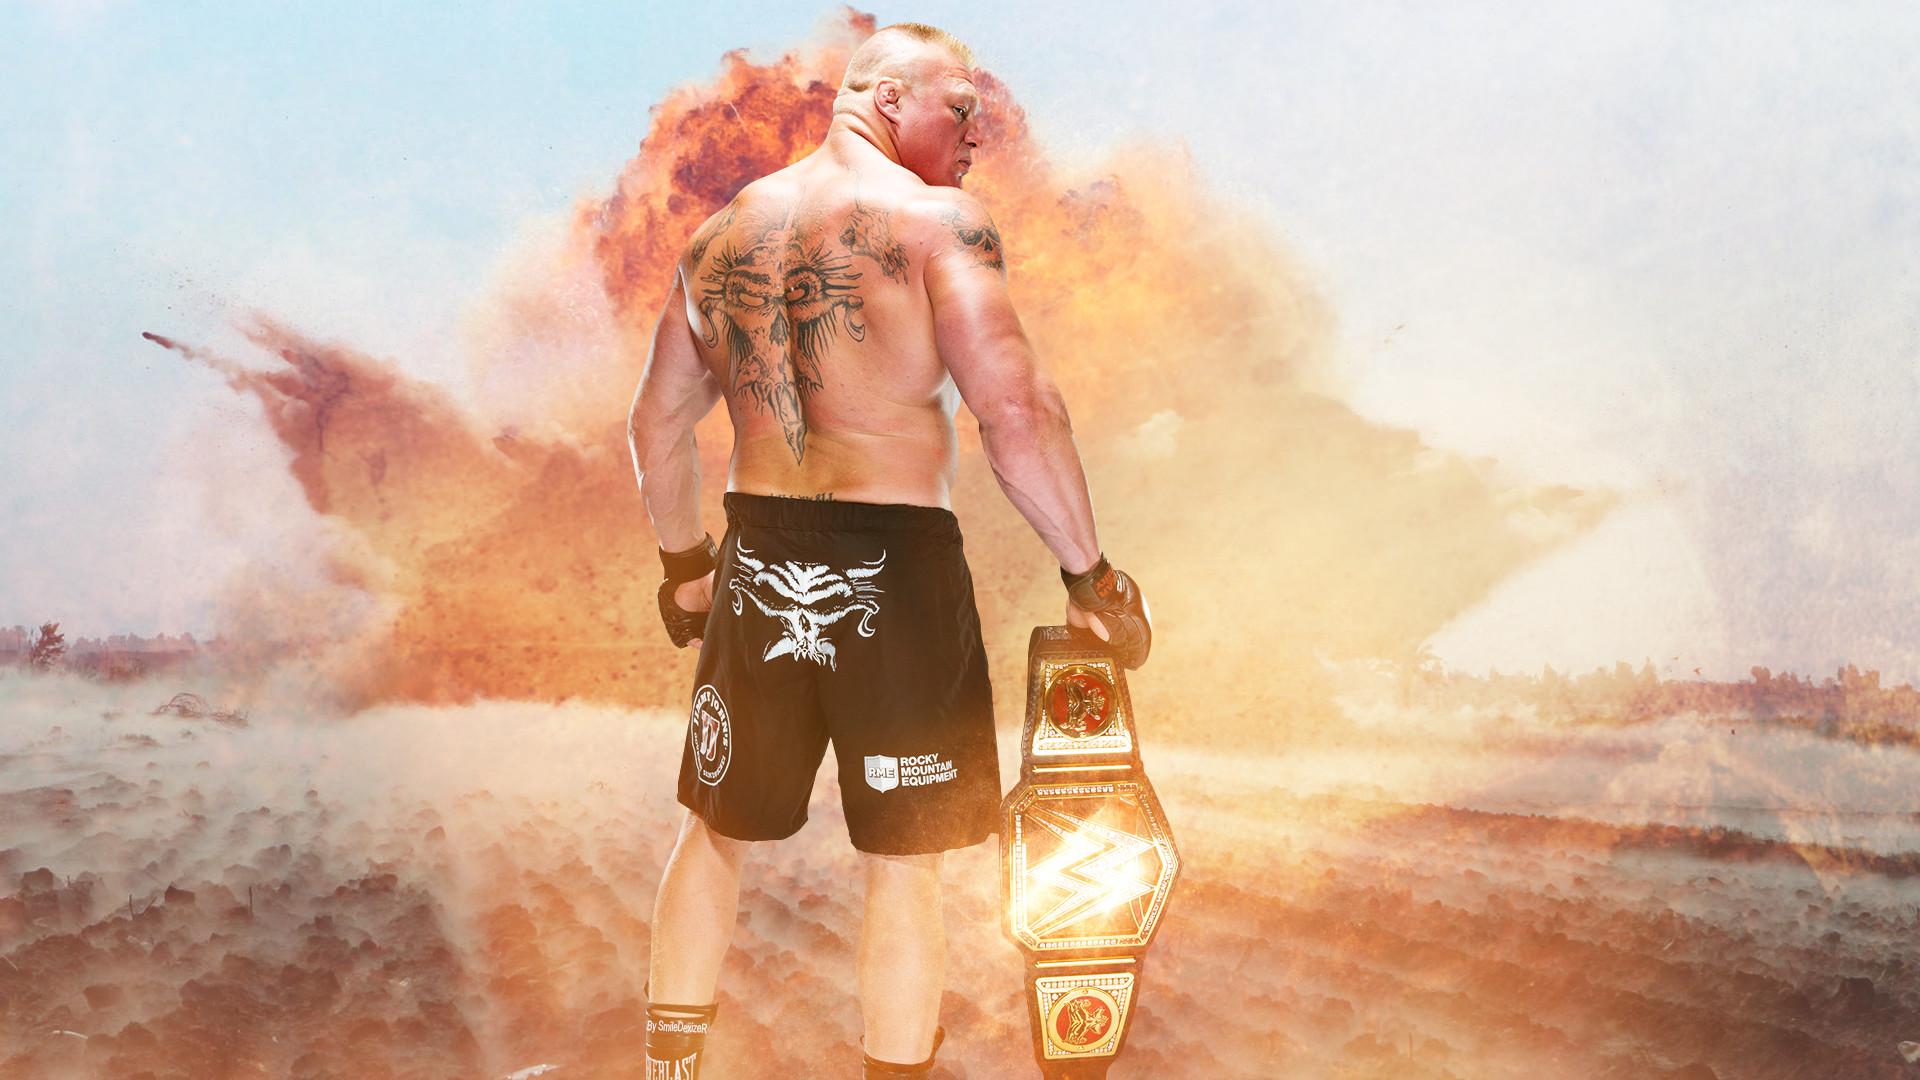 WWE Brock Lesnar 2018 Wallpaper (80+ pictures)